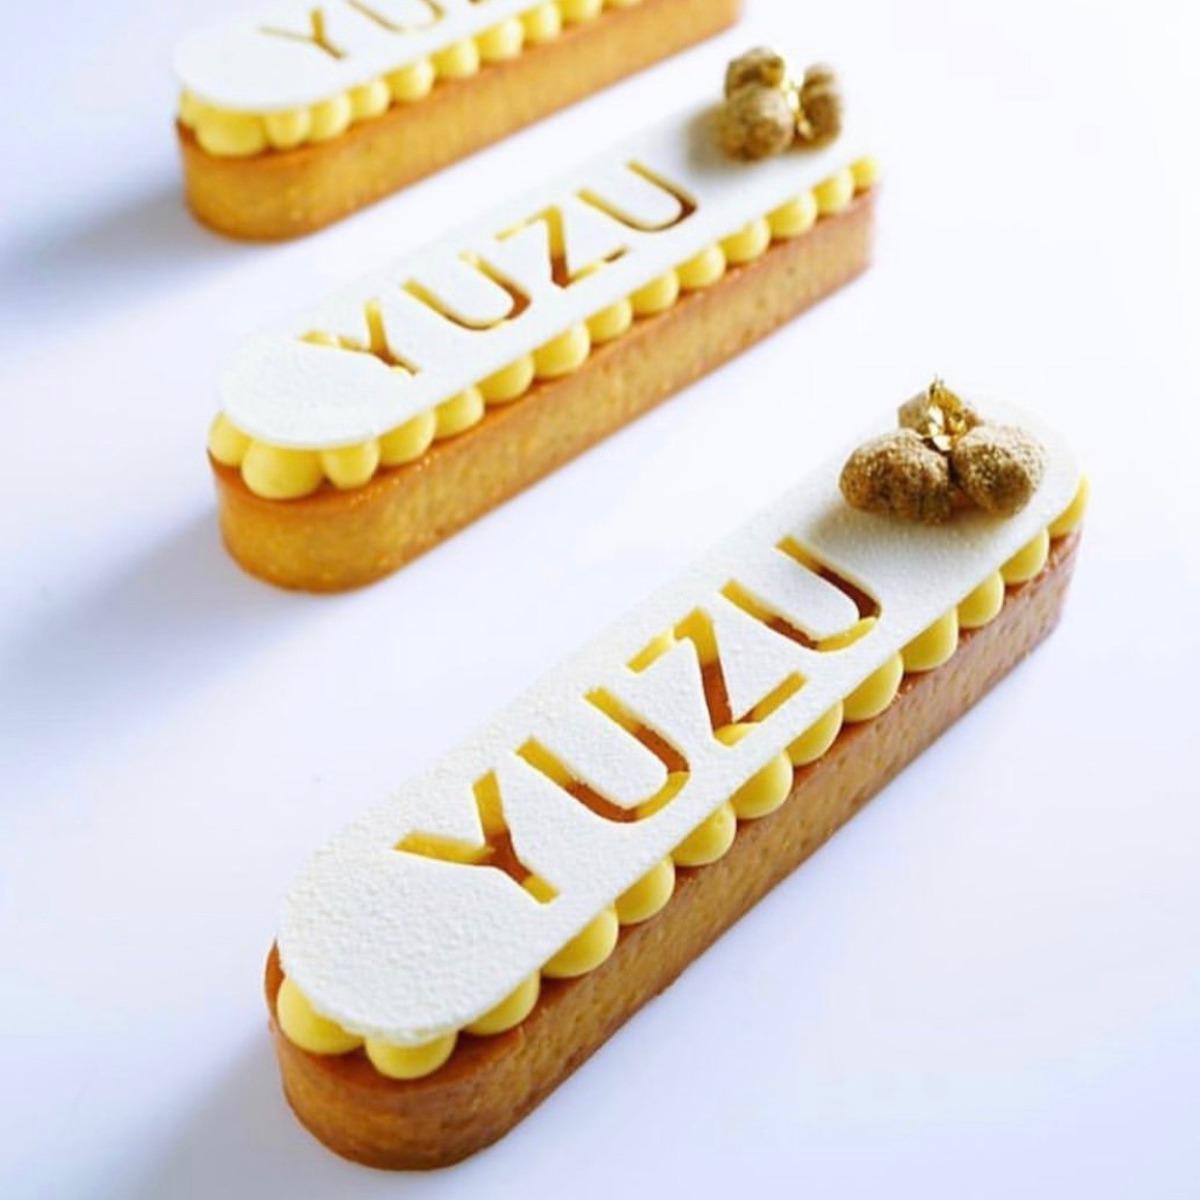 YUZU INSPIRATION